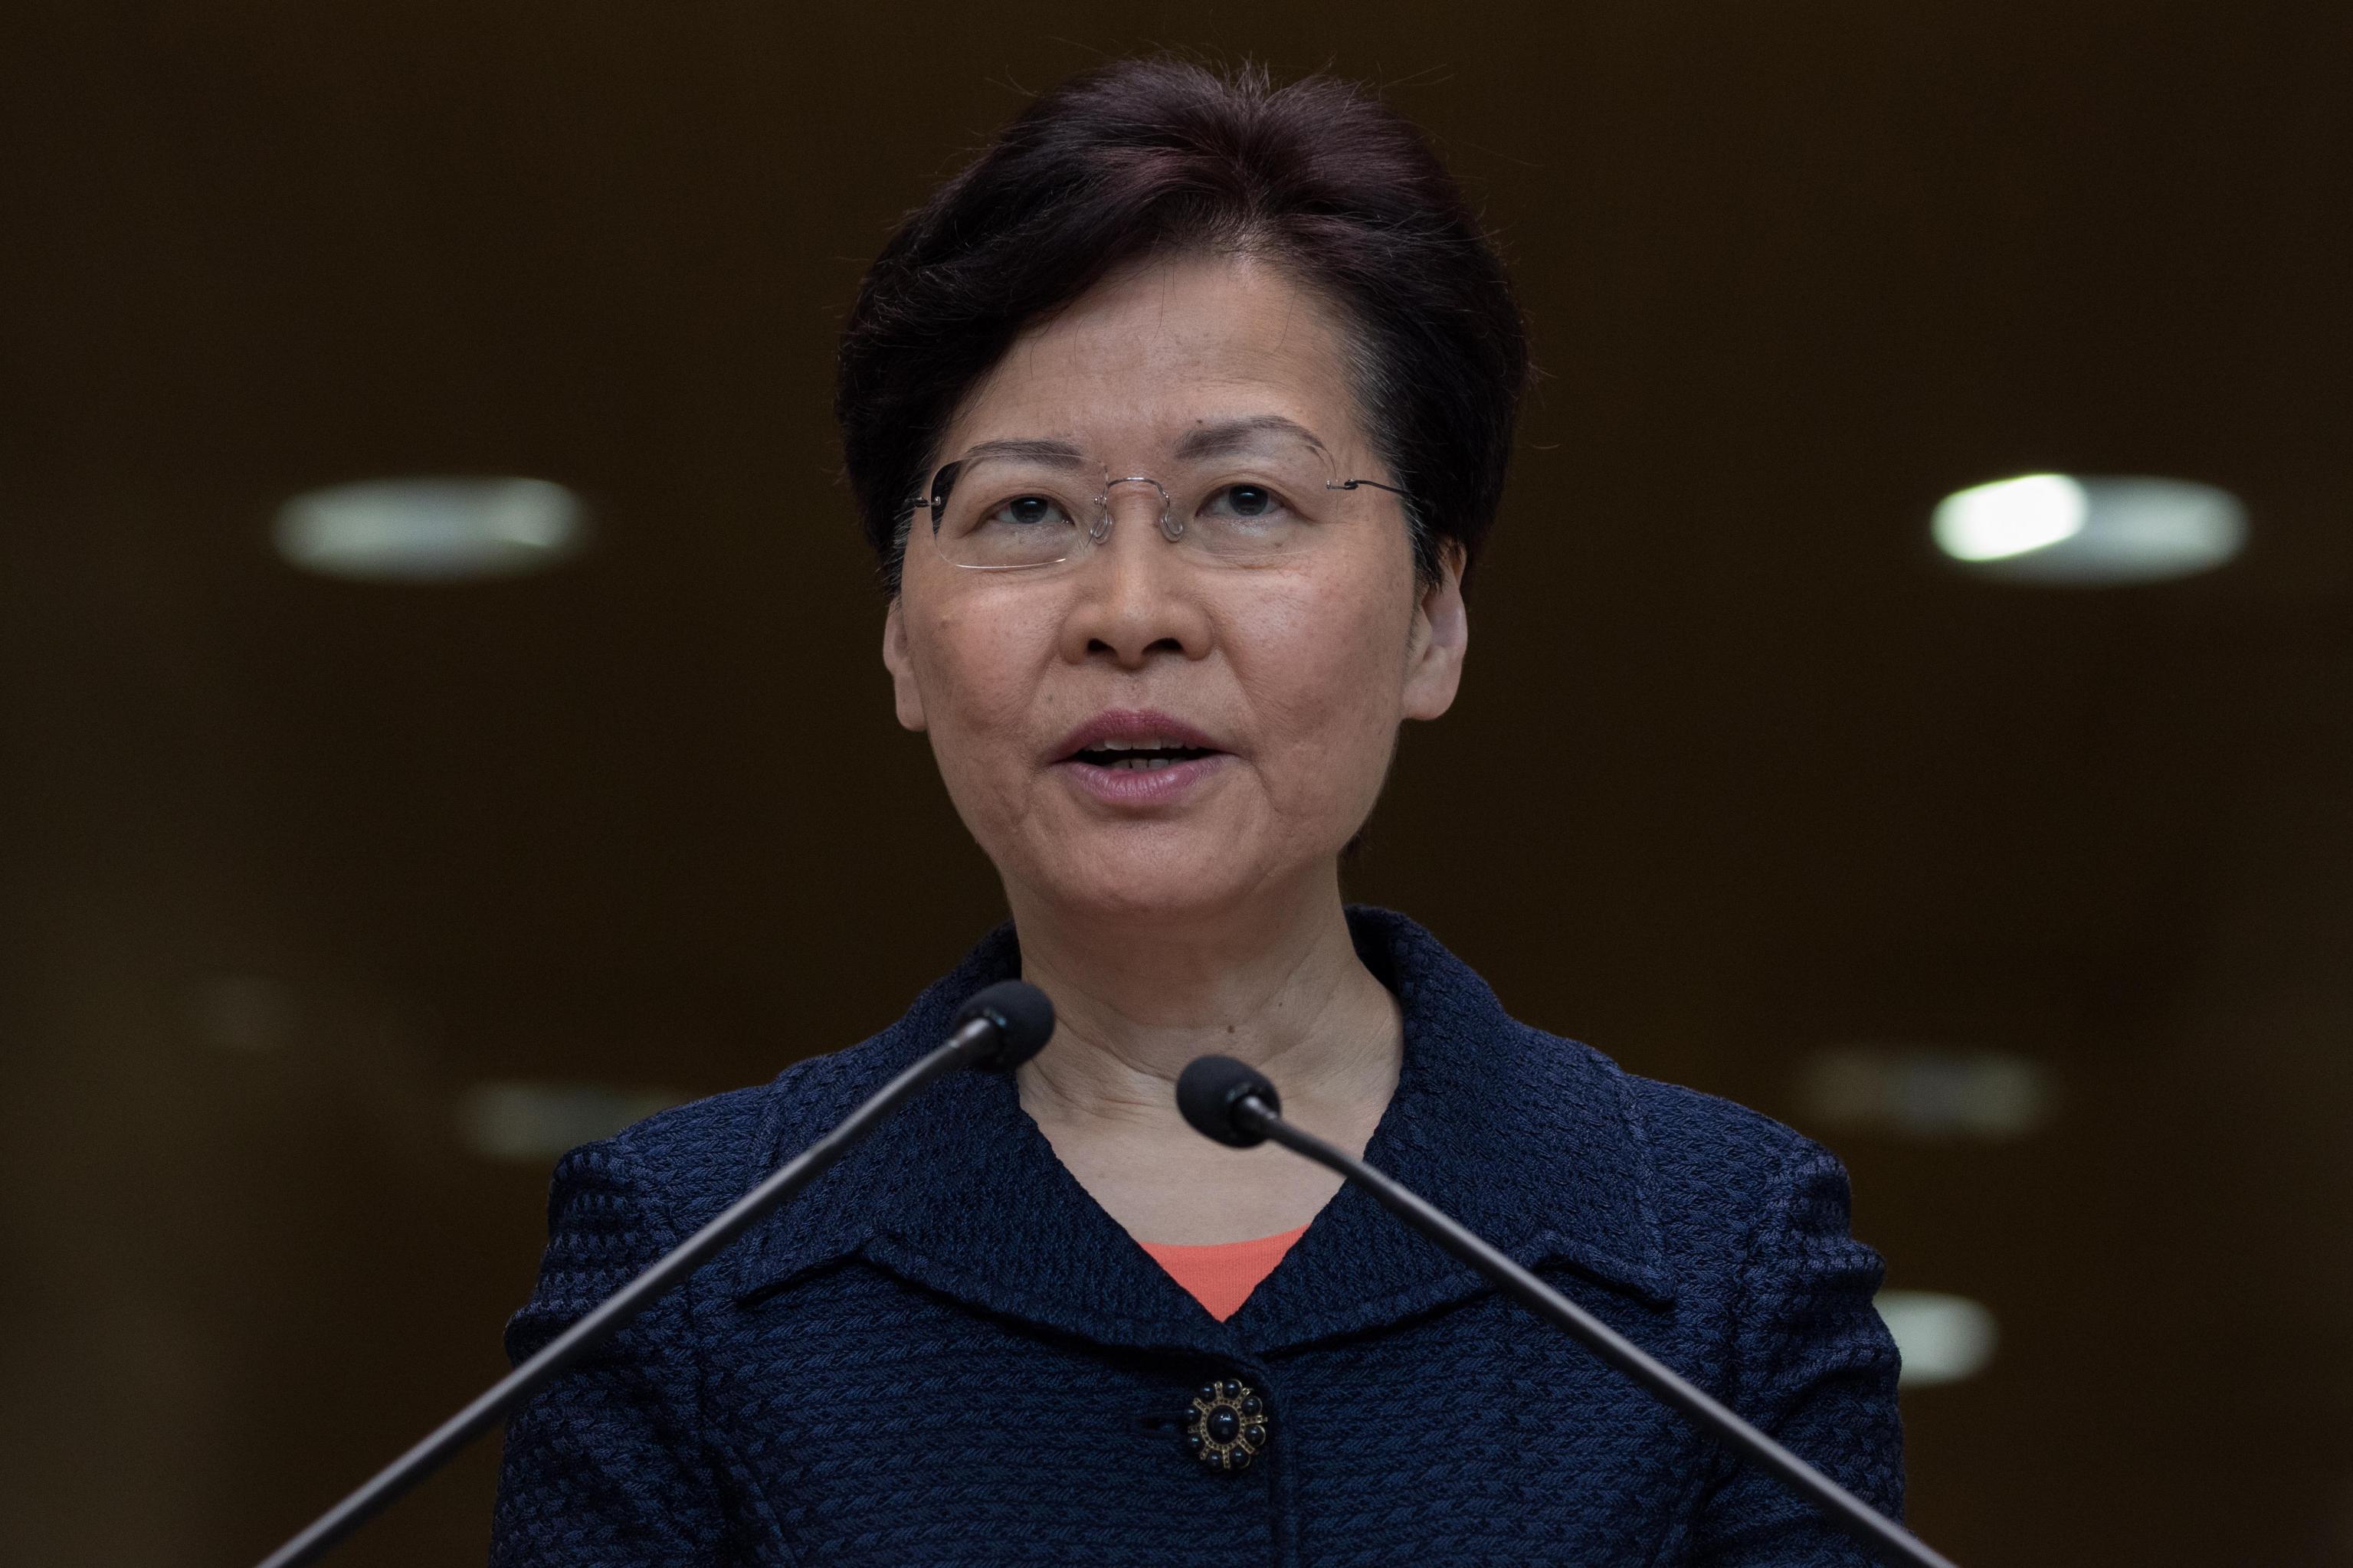 Hong Kong, la governatrice Carrie Lam non si dimette